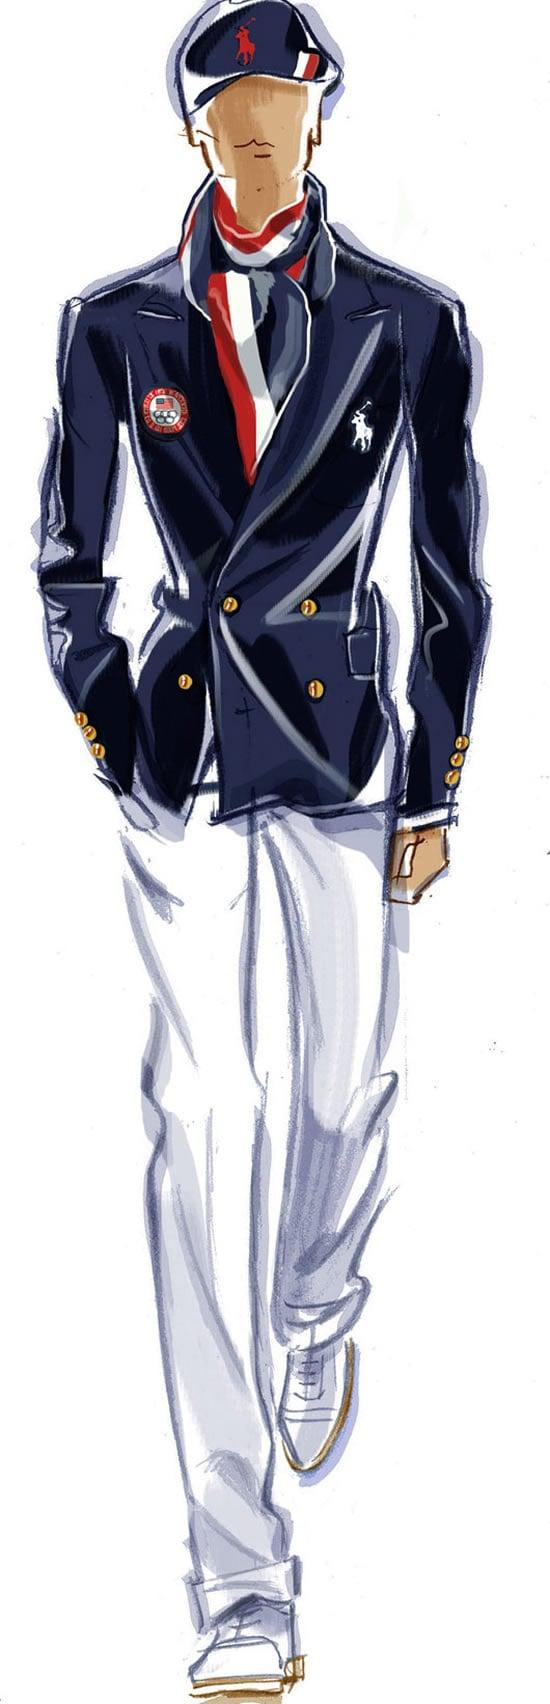 team-usa-olympic-uniforms-1.jpg